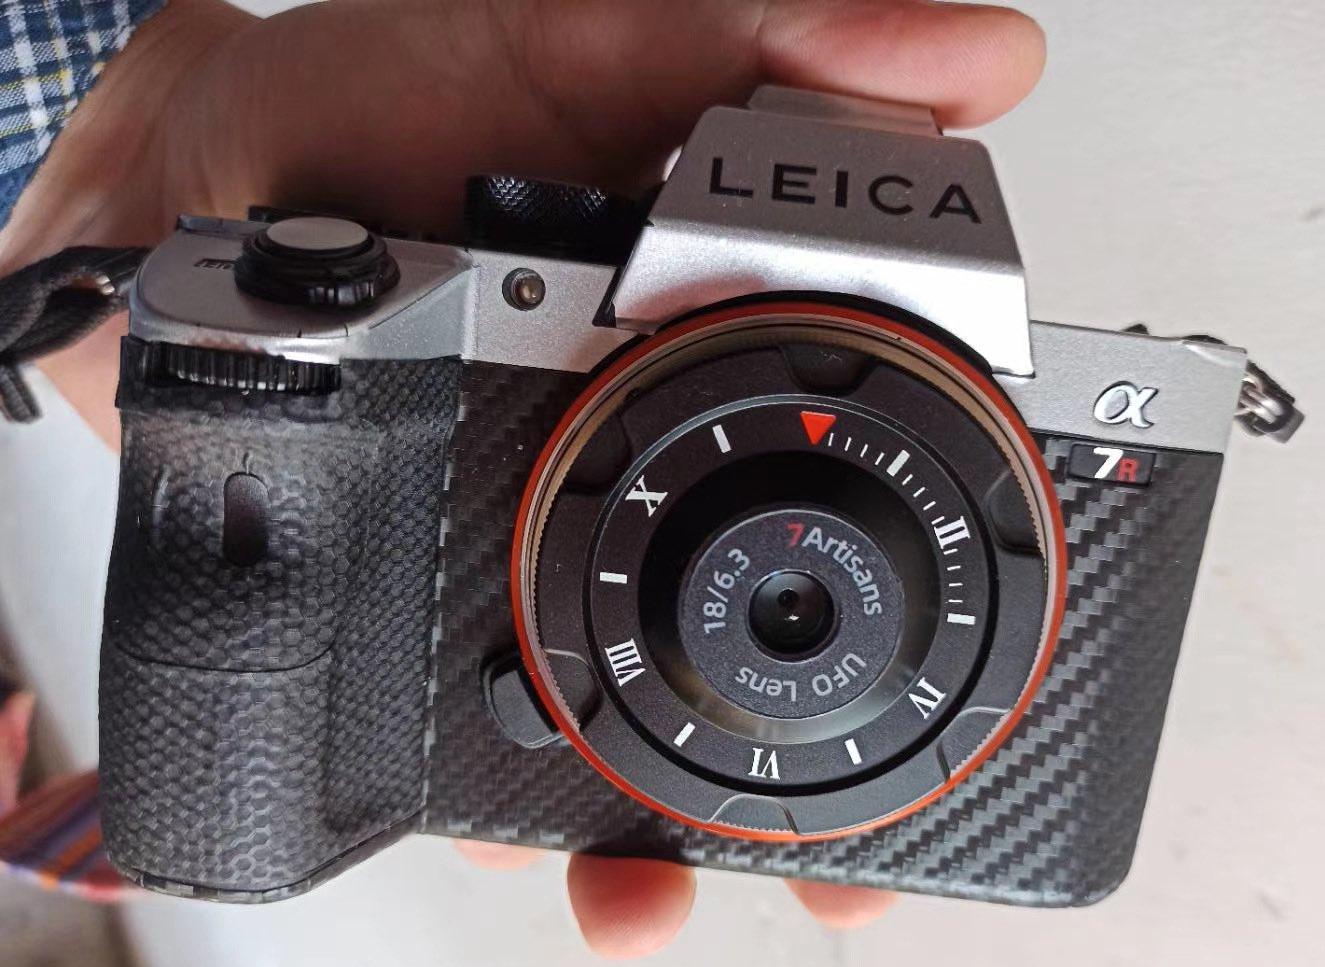 Объектив 7Artisans 18mm f/6.3 с камерой Sony